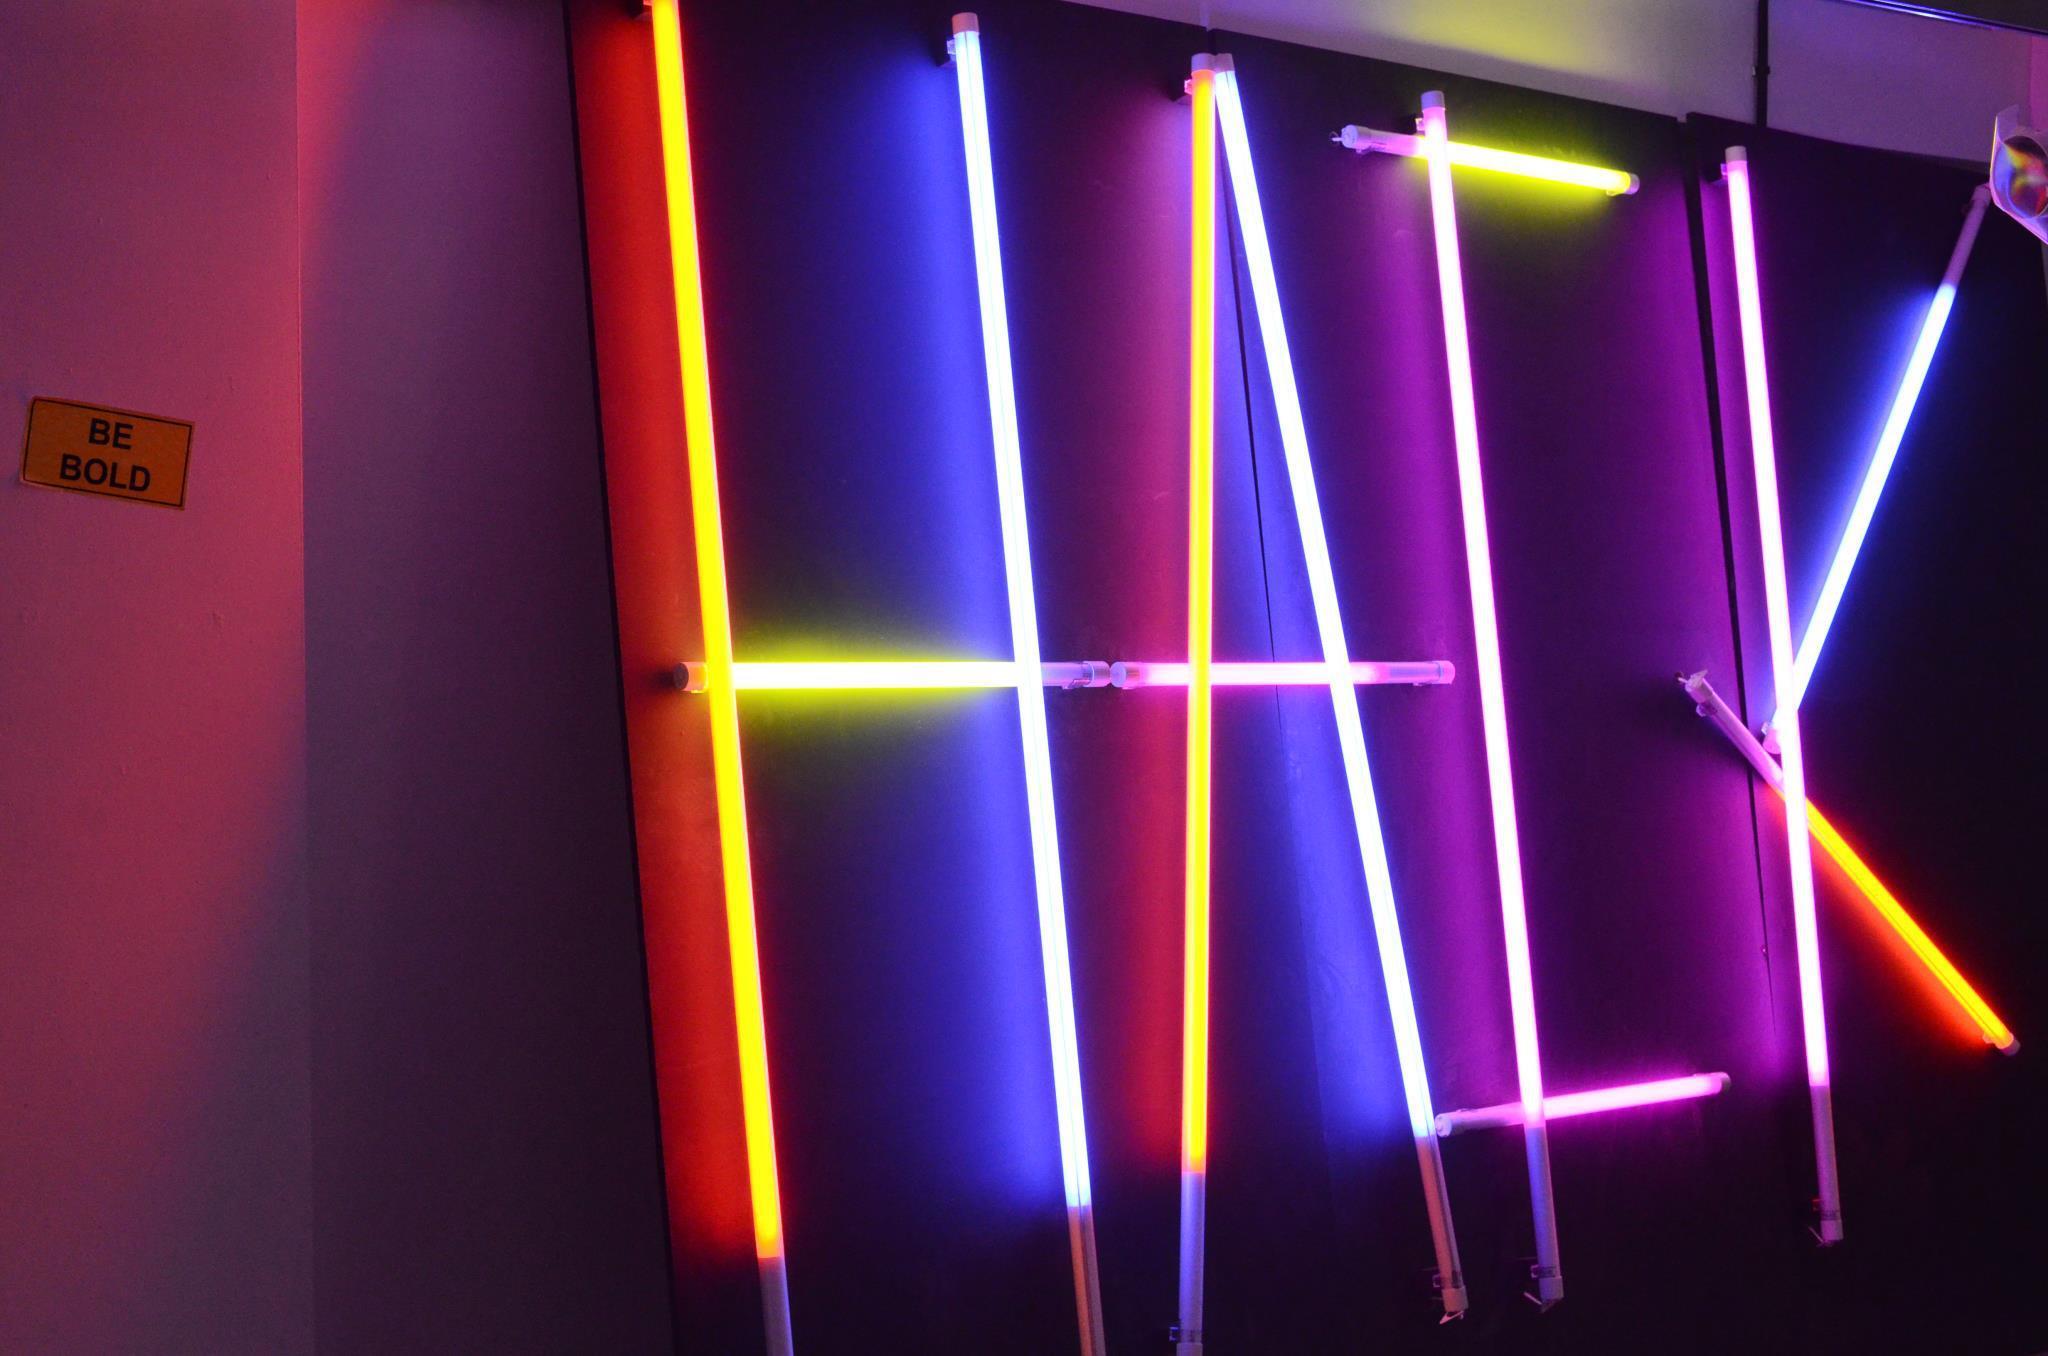 Facebook Hackathon Lights